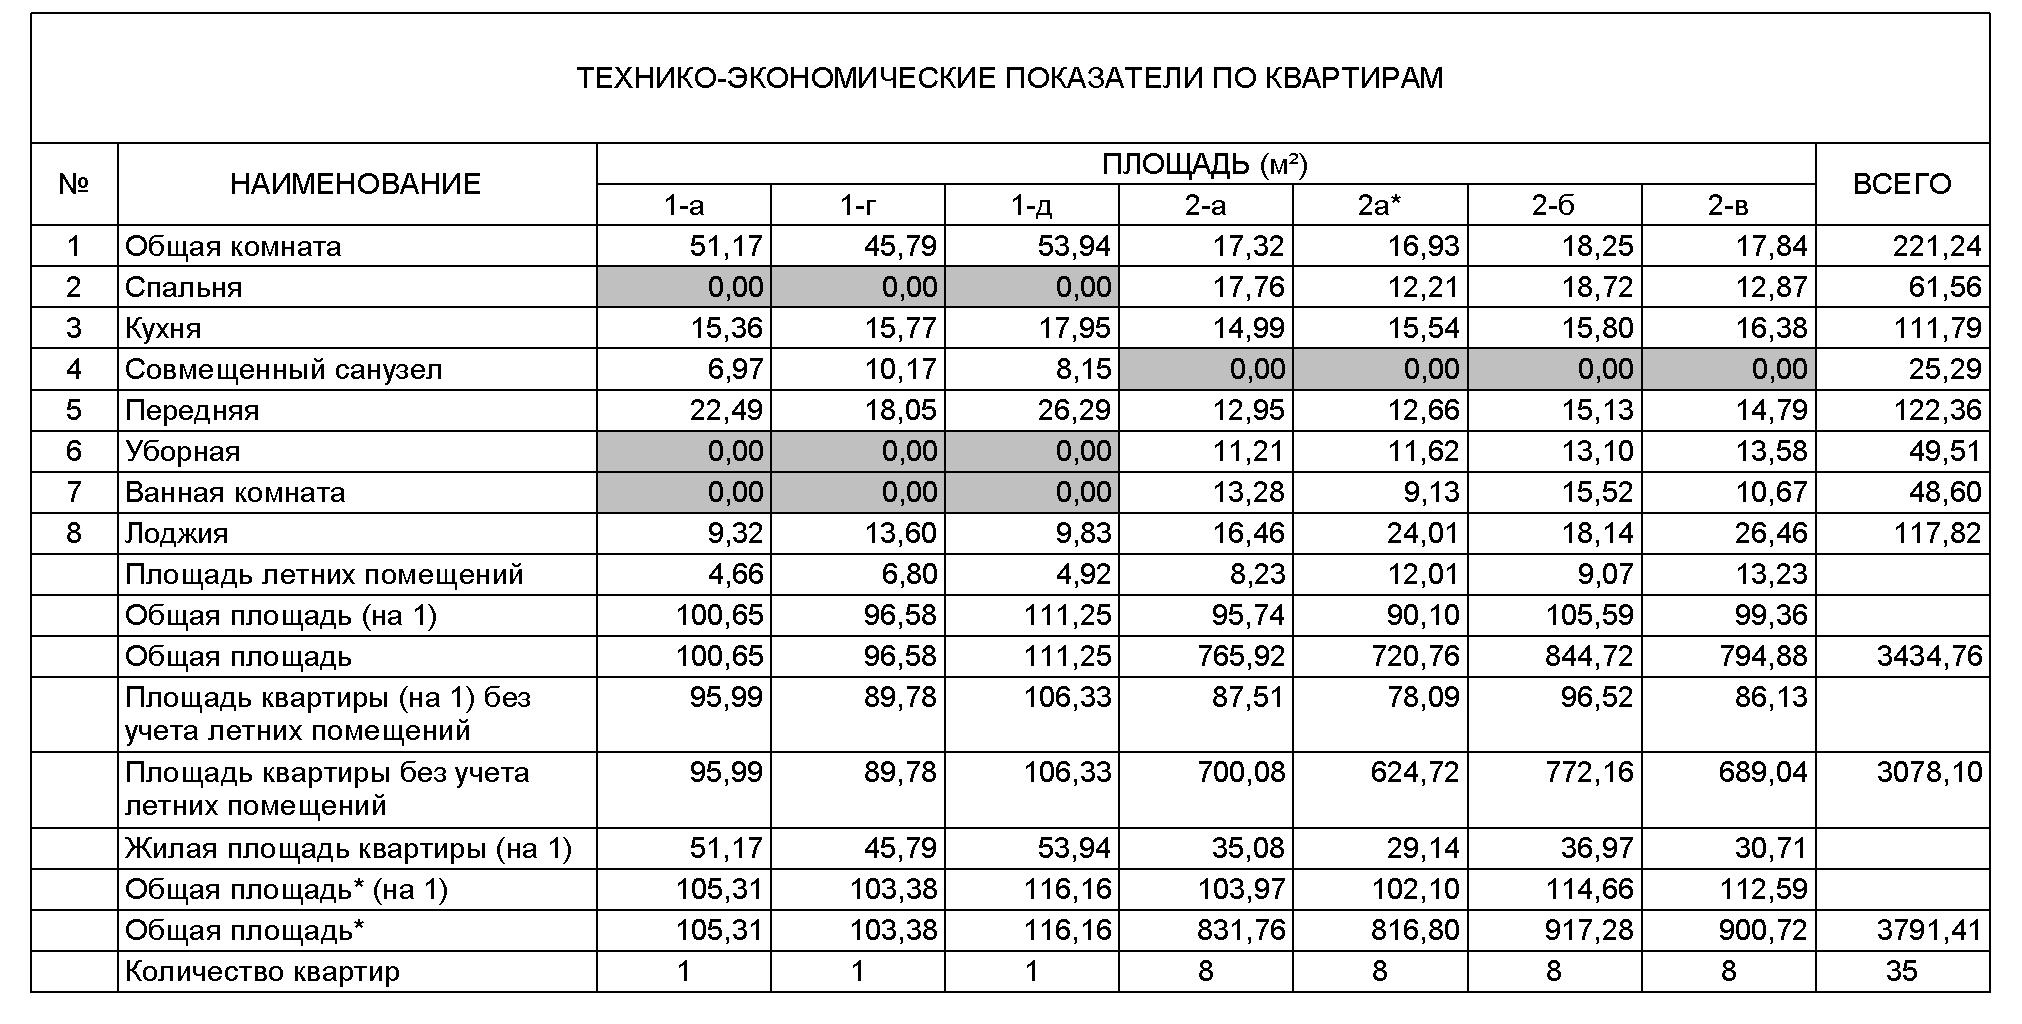 Вариант заполнения справки ТЭП с описанием квартир МКД